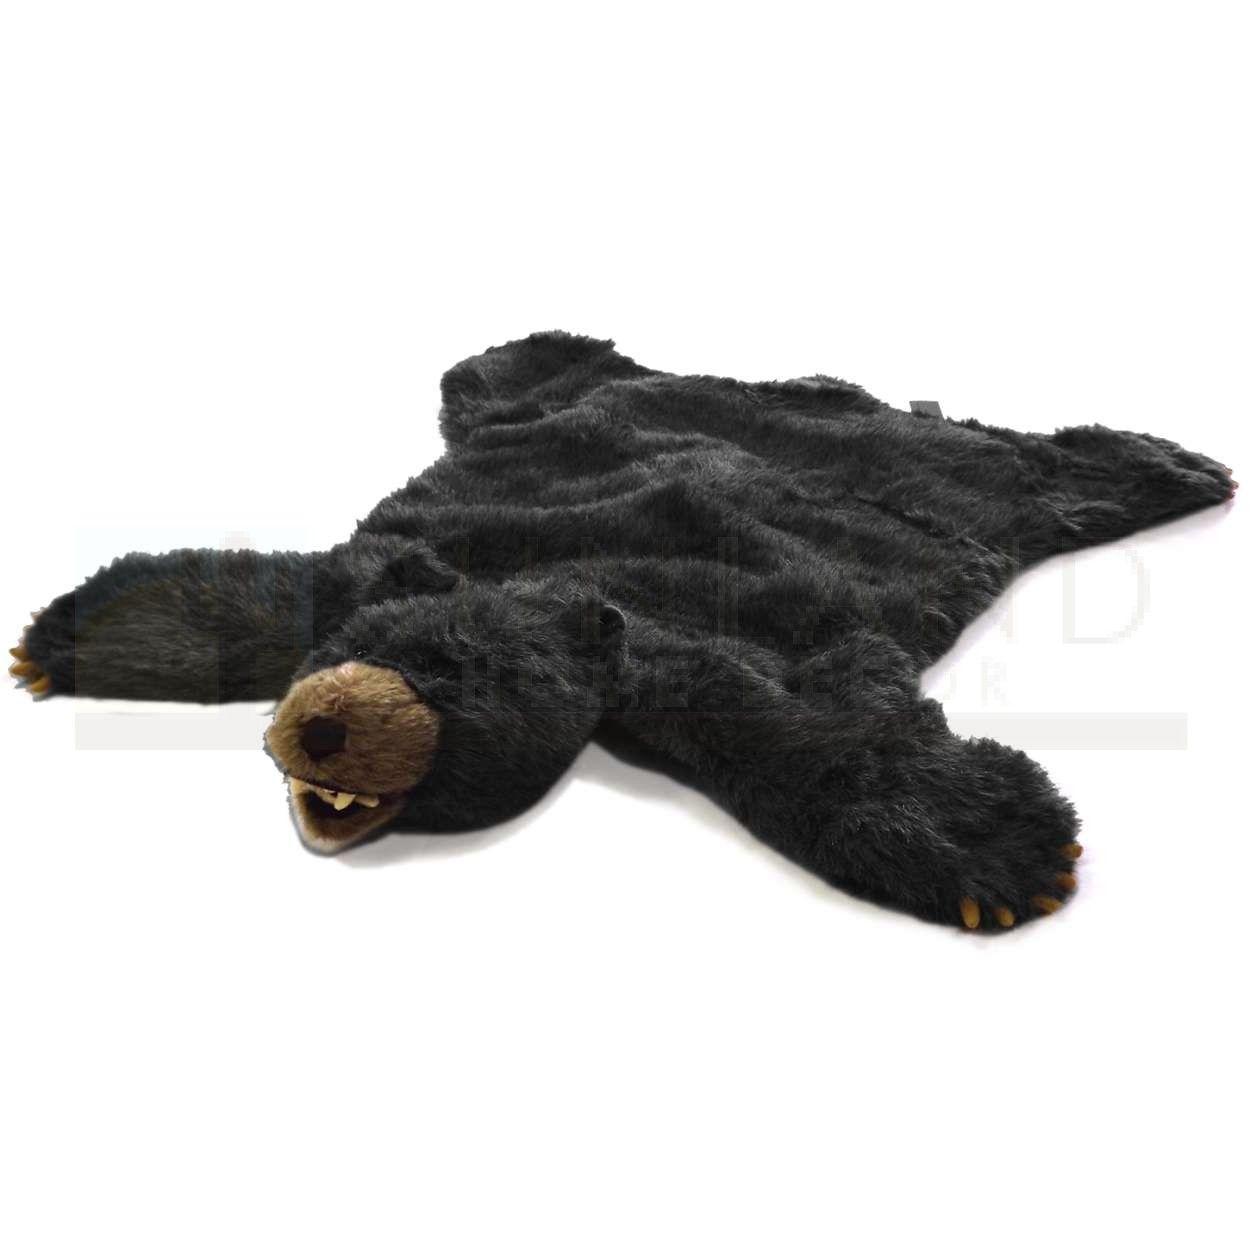 Sbr201 Plush Animal Rug 36in Black Bear